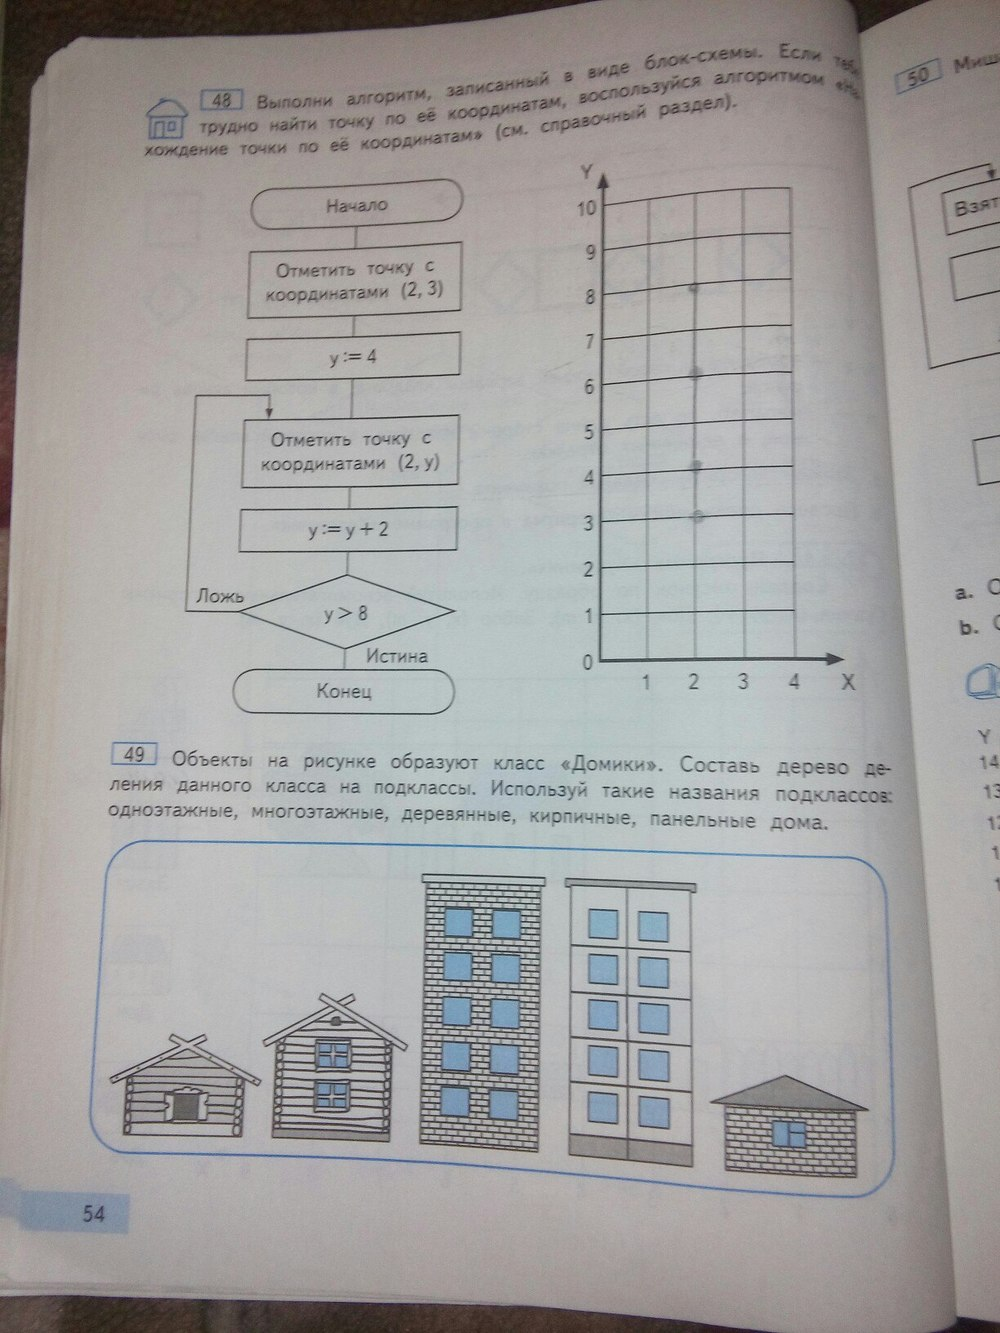 Решебник к информатике бененсон паутова 4 класс онлайн